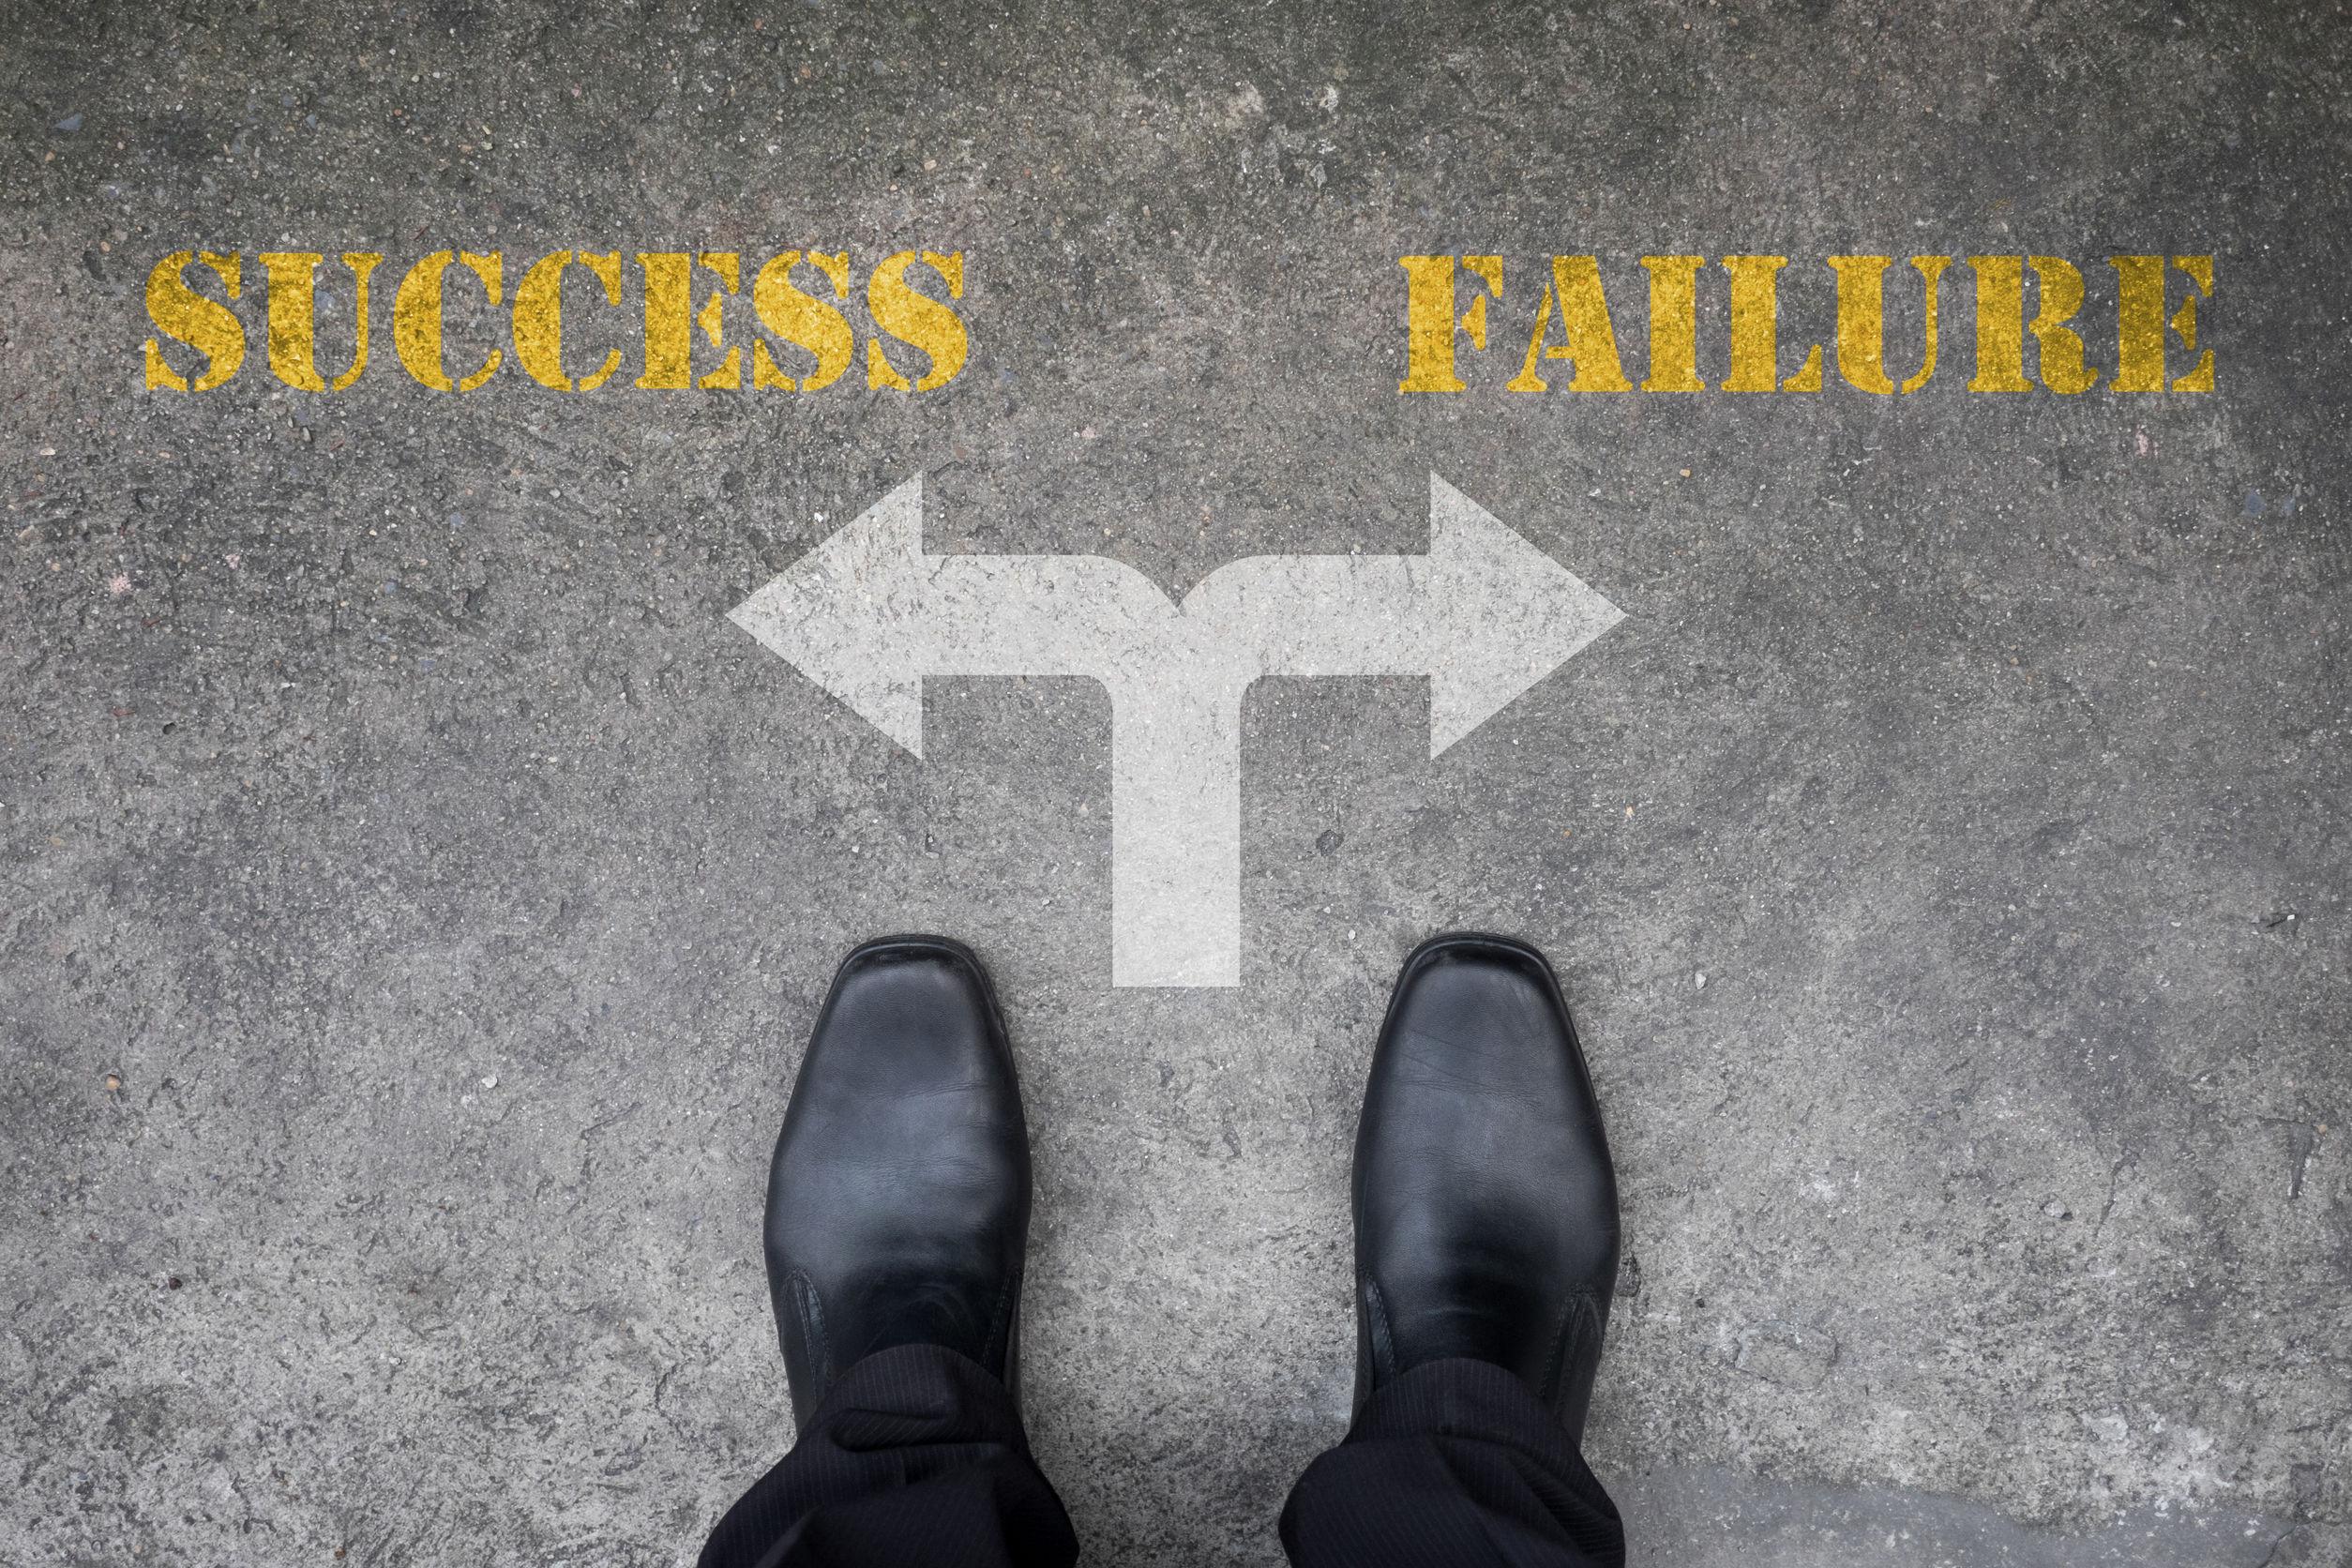 Reasons why advocacy efforts fail